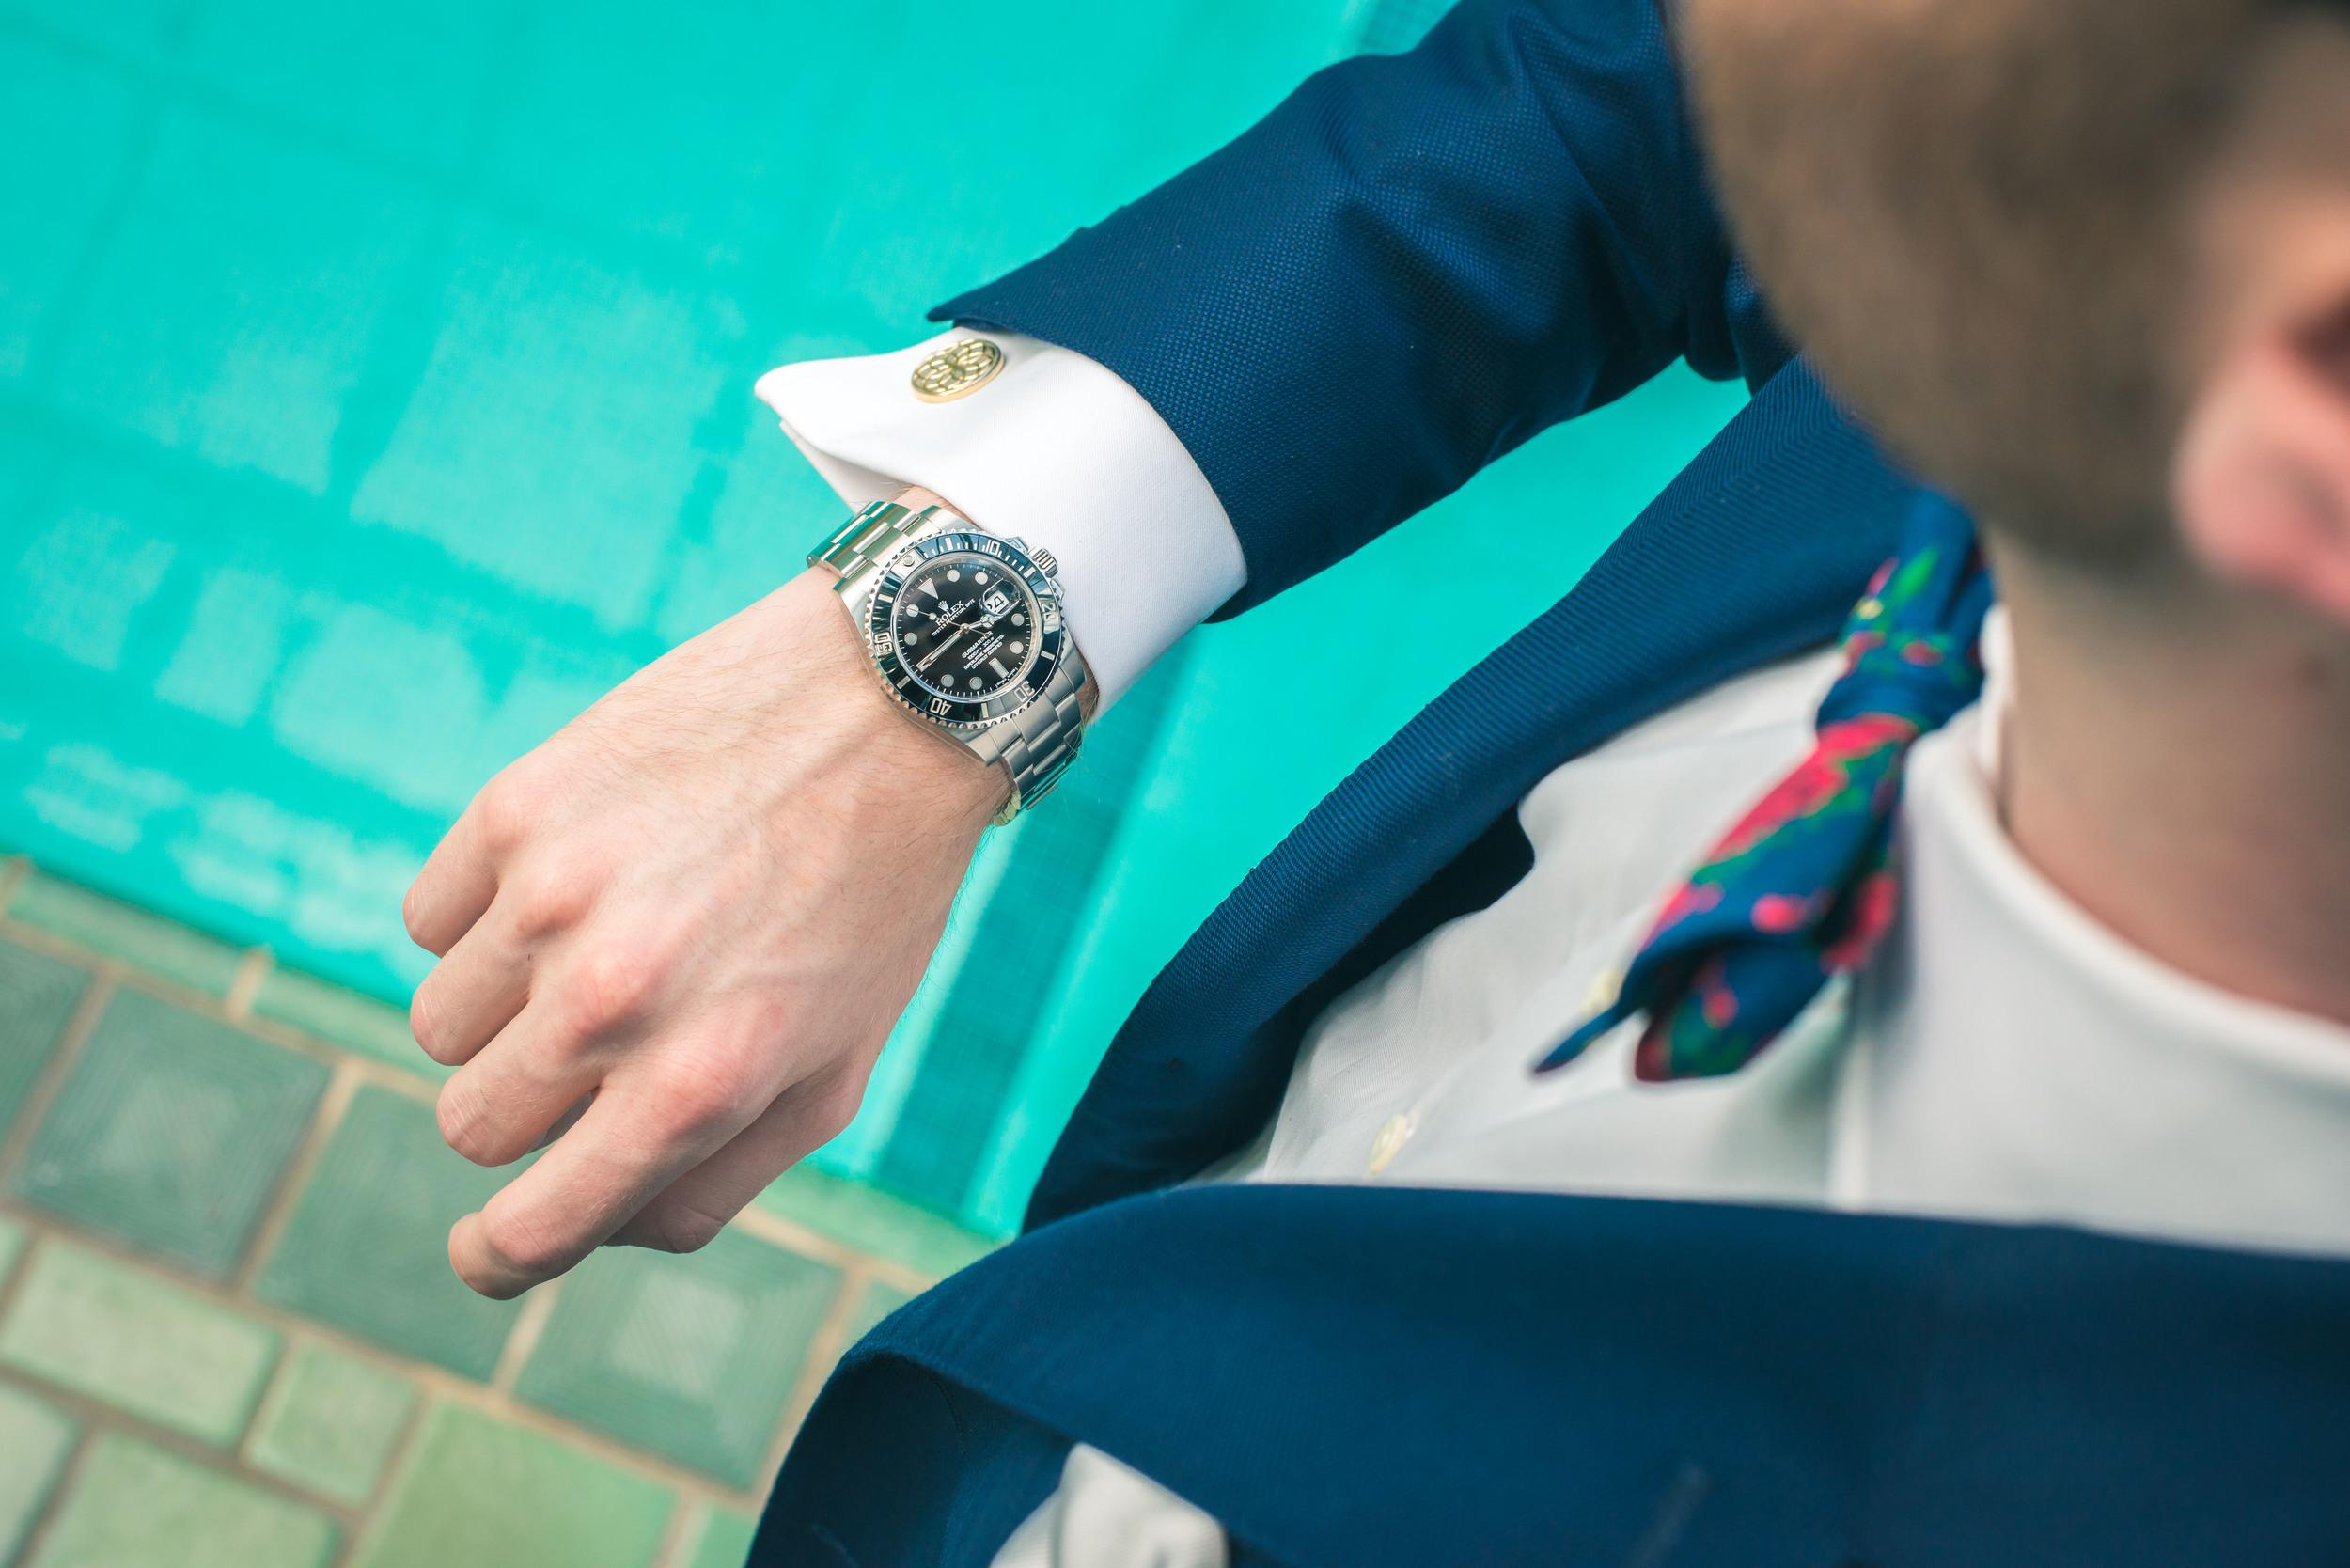 Watch: Rolex, Shirt: Ledbury, Suit: J. Lindeburg, Tie: The Tie Bar, Photo: Alec Hutchins Photography, Model: Noah Williams, Location: Reynolda House Museum of American Art historic indoor pool.